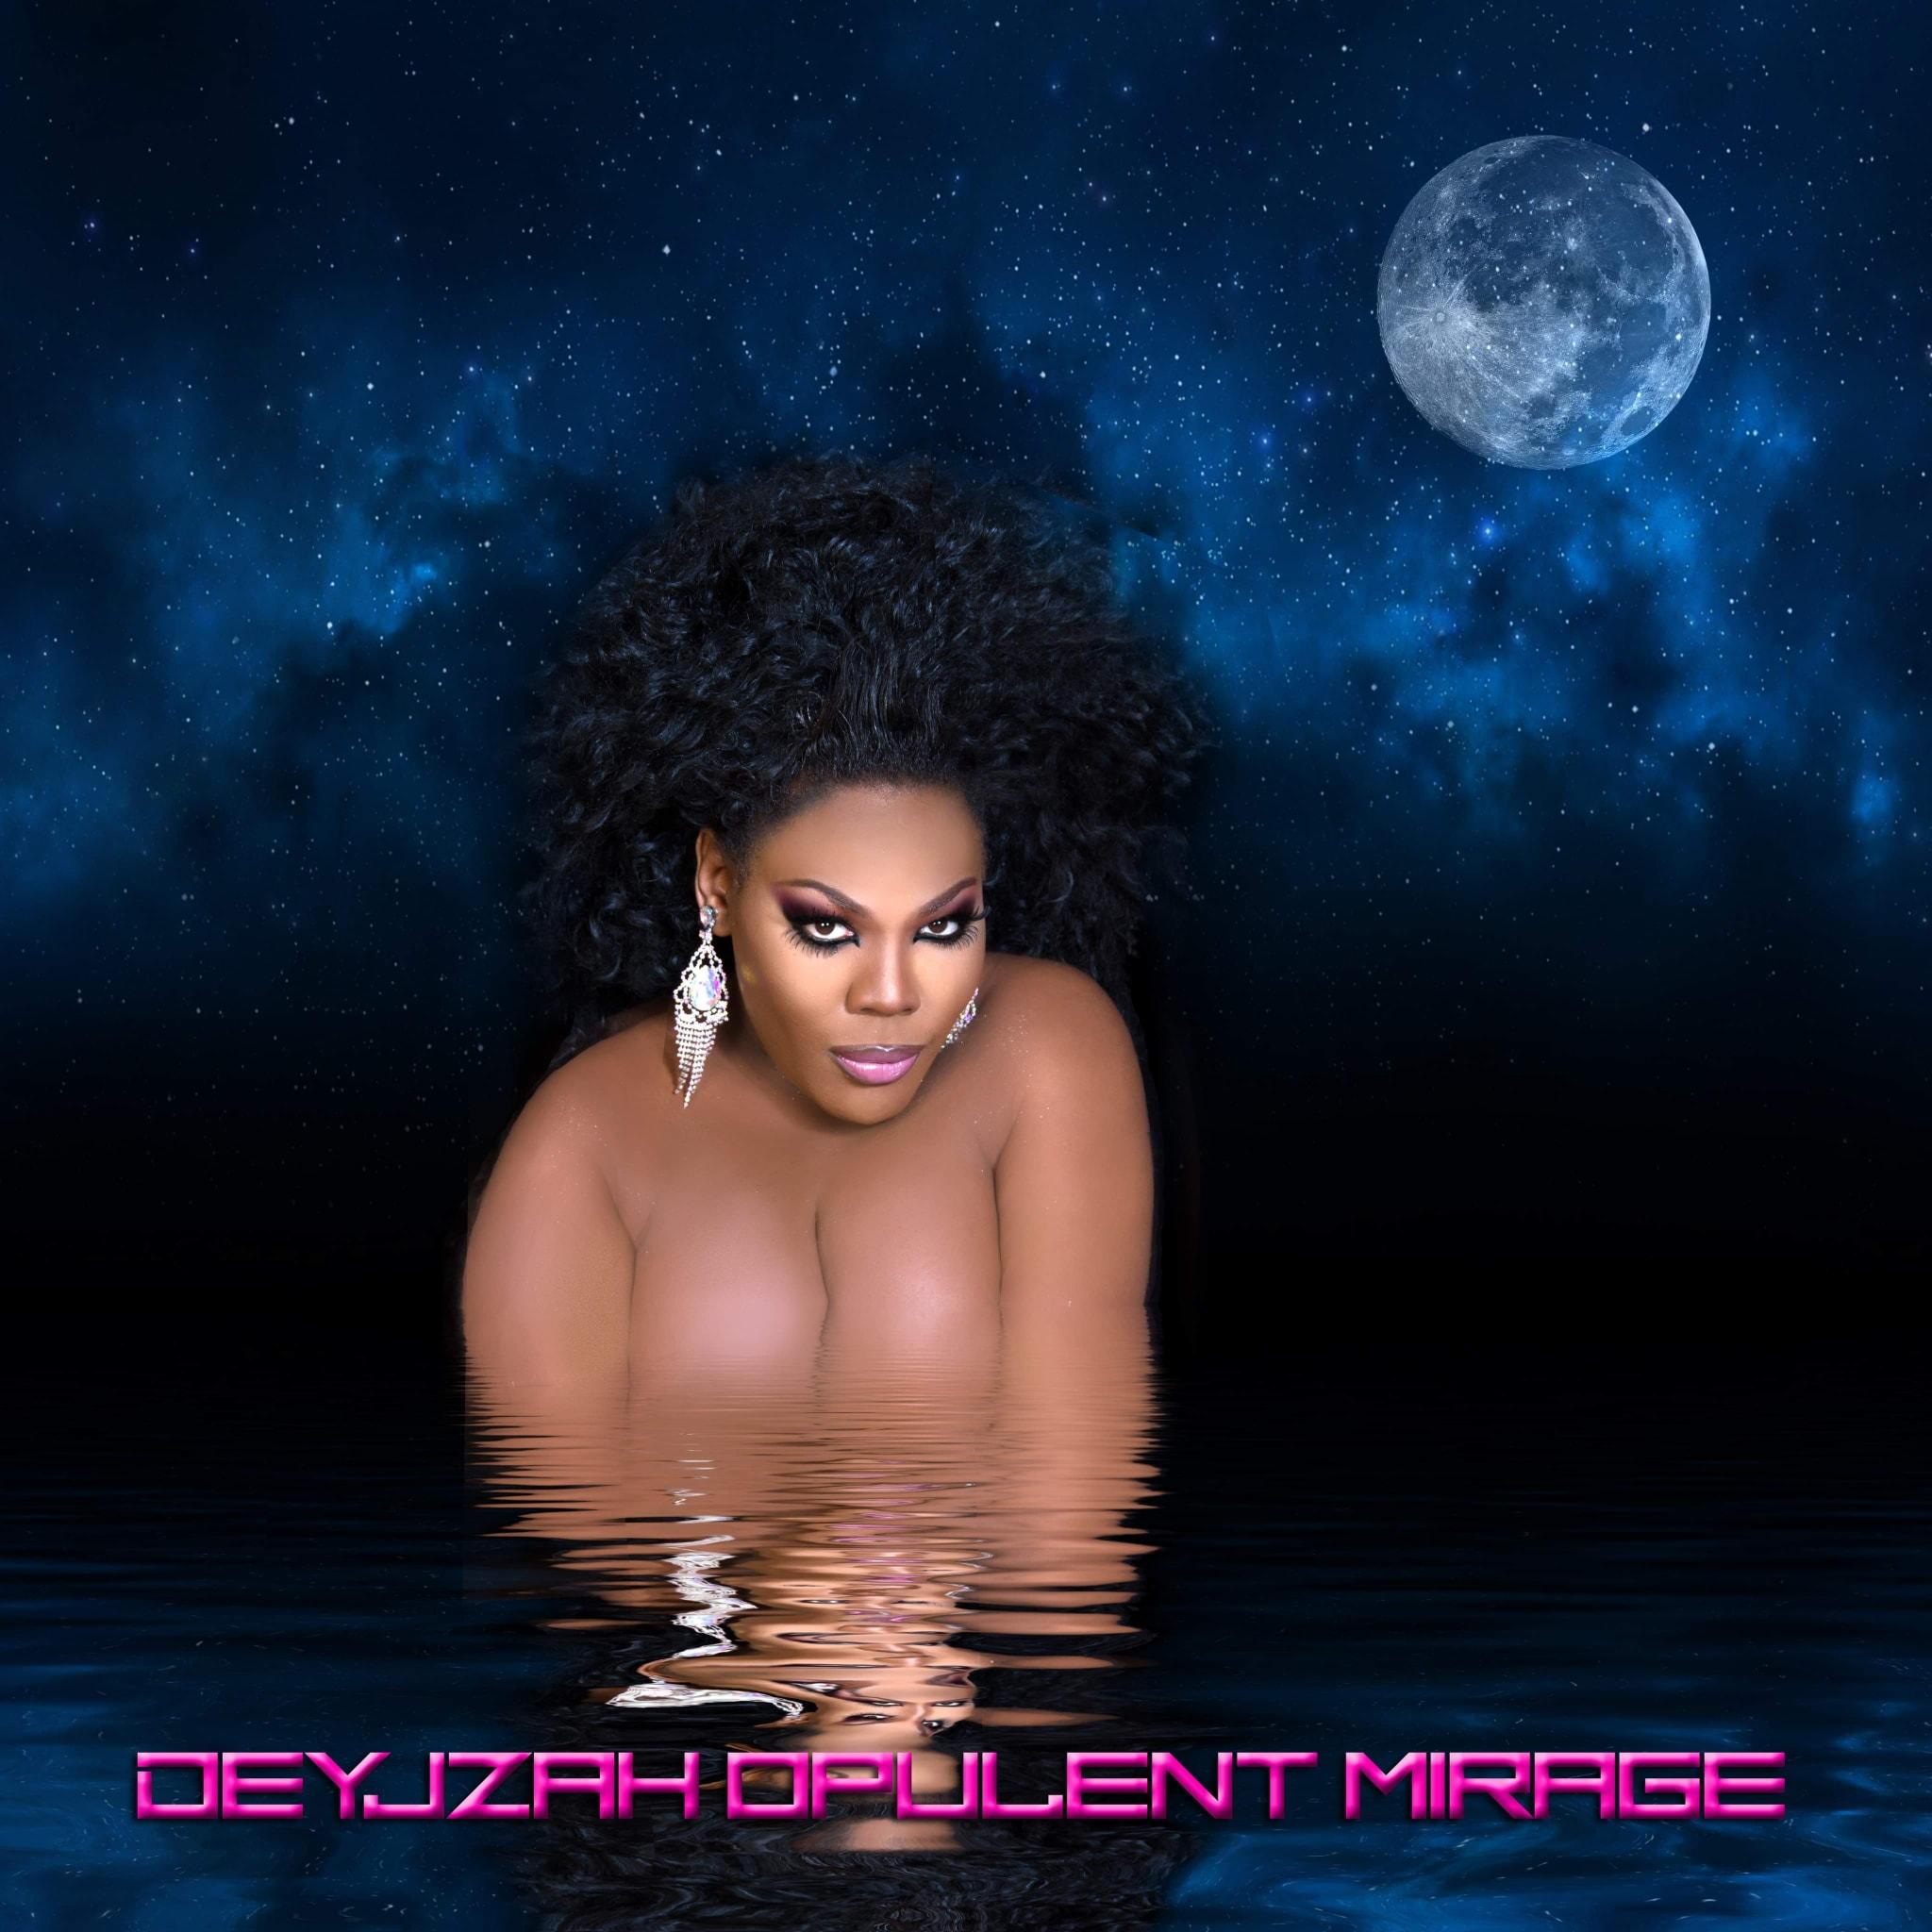 Dey'Jzah Opulent Mirage